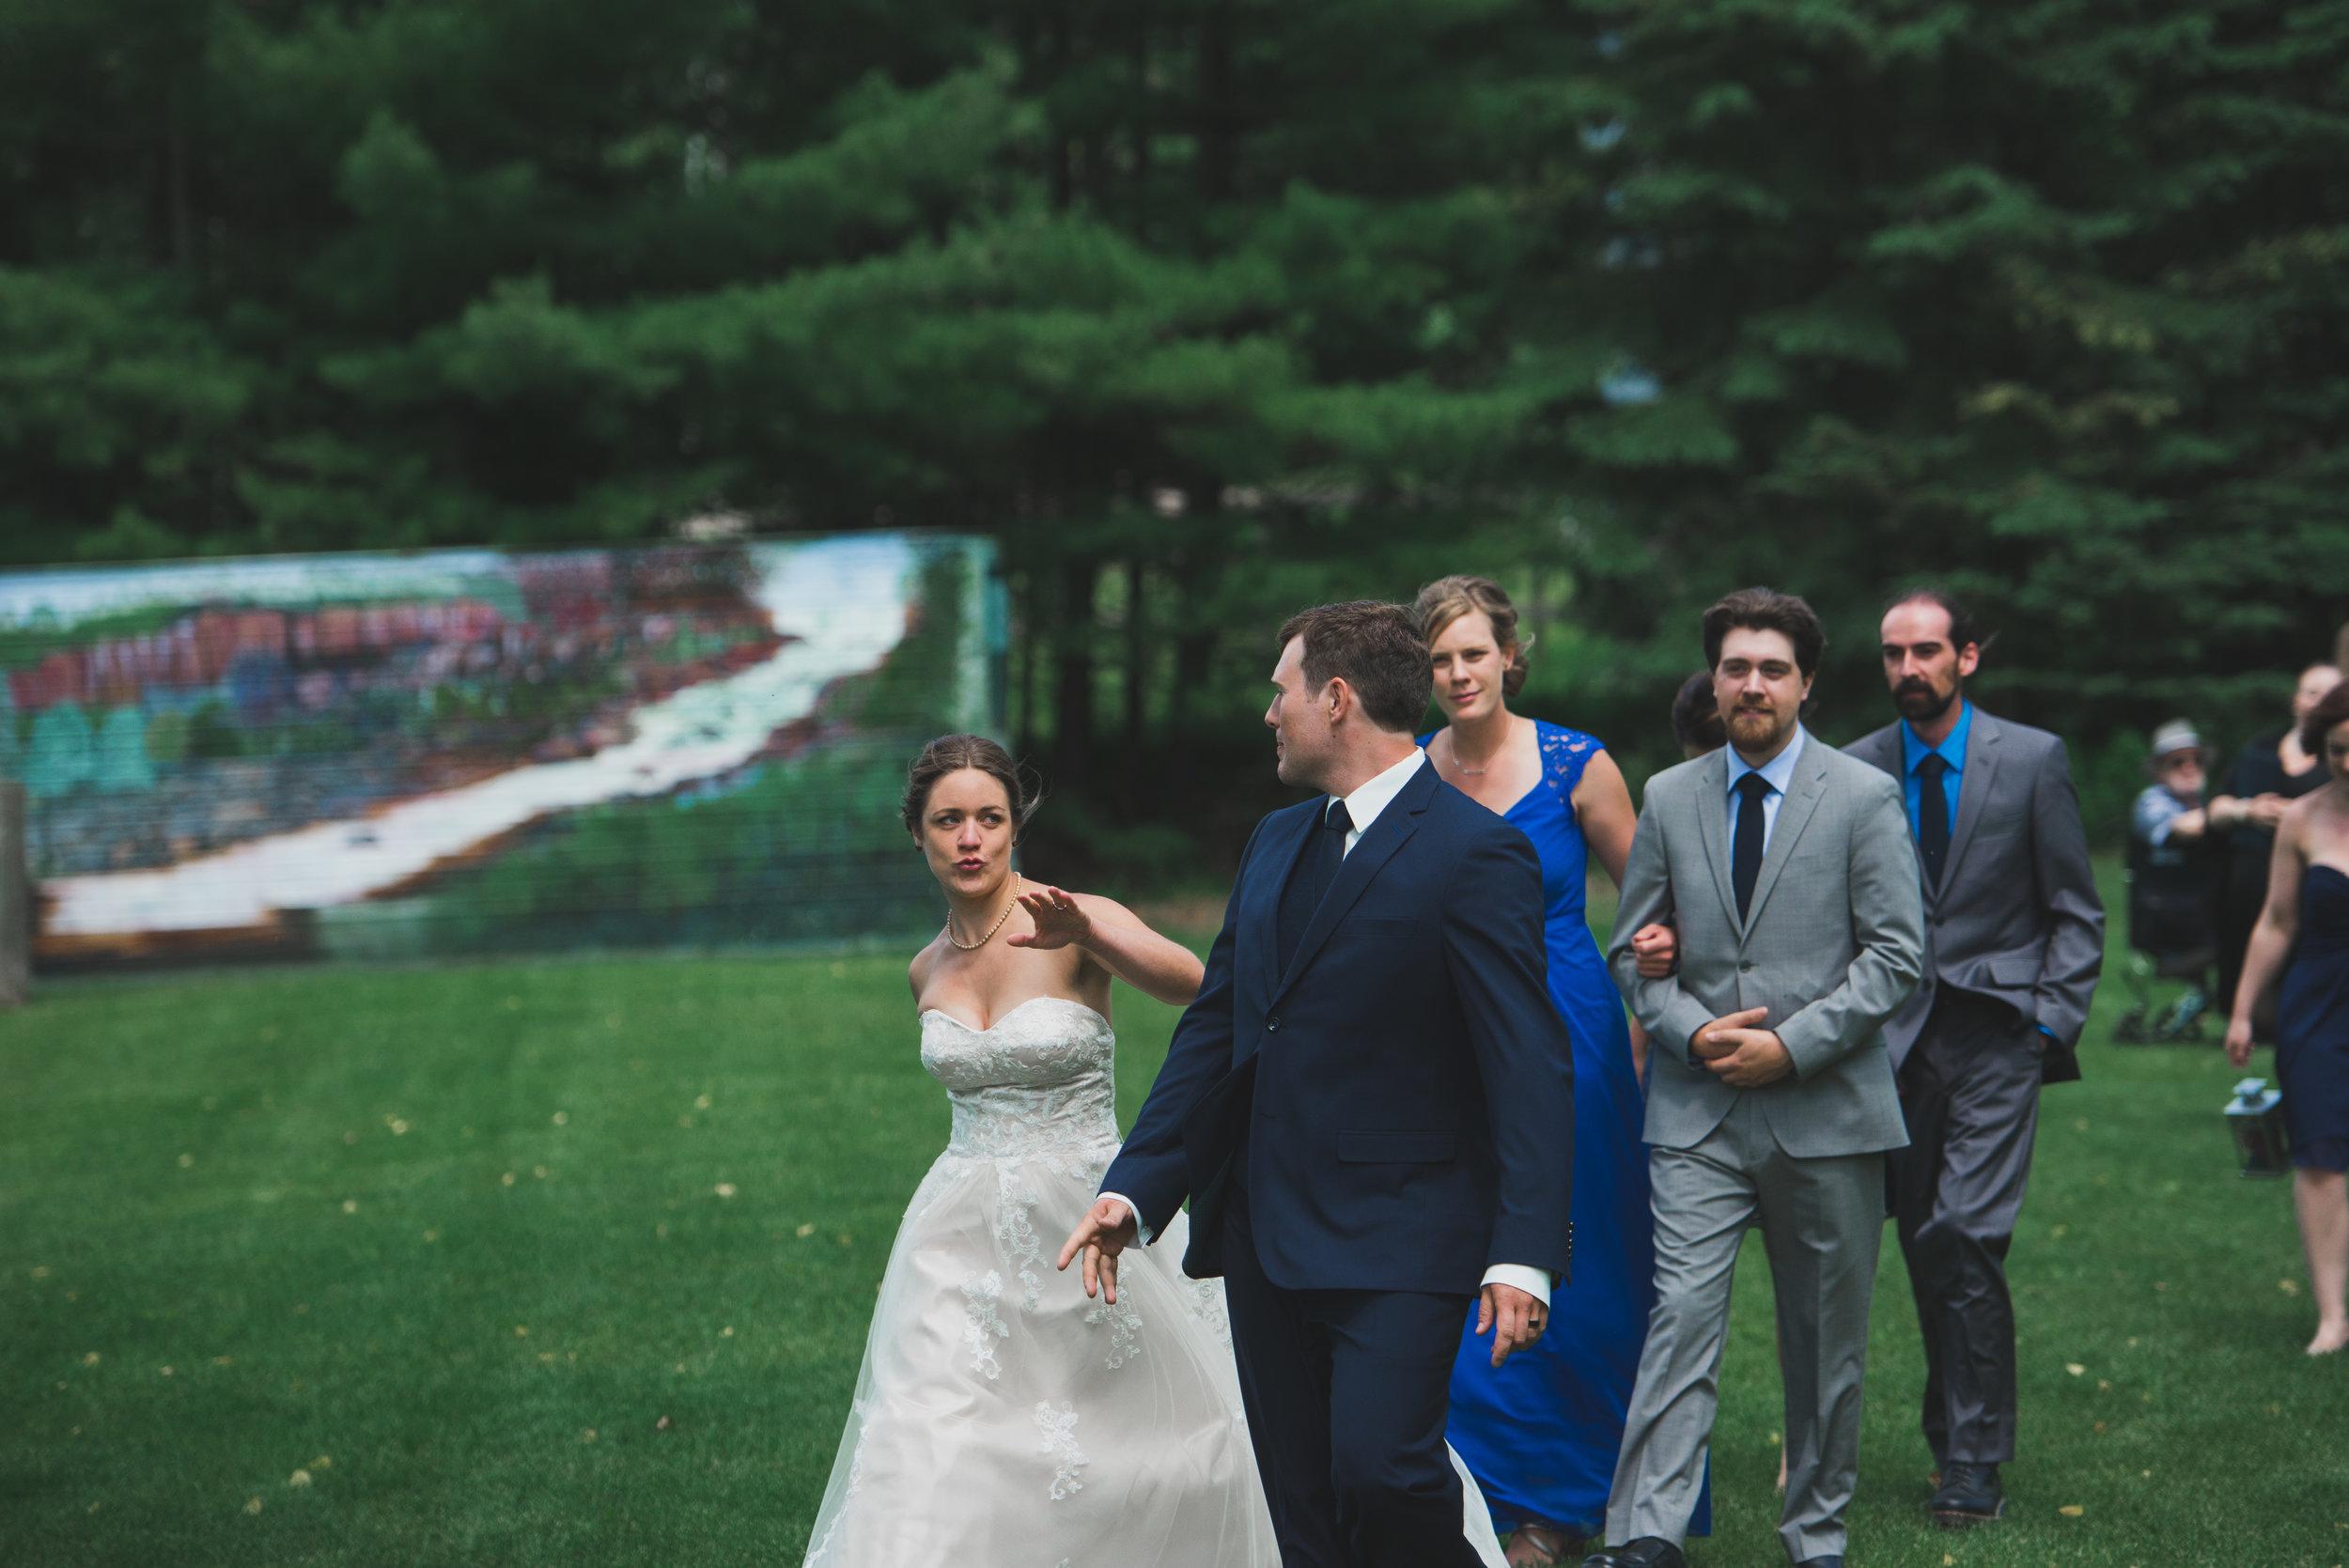 SheriCorey-Wedding-June242017-Ceremony-00095.jpg